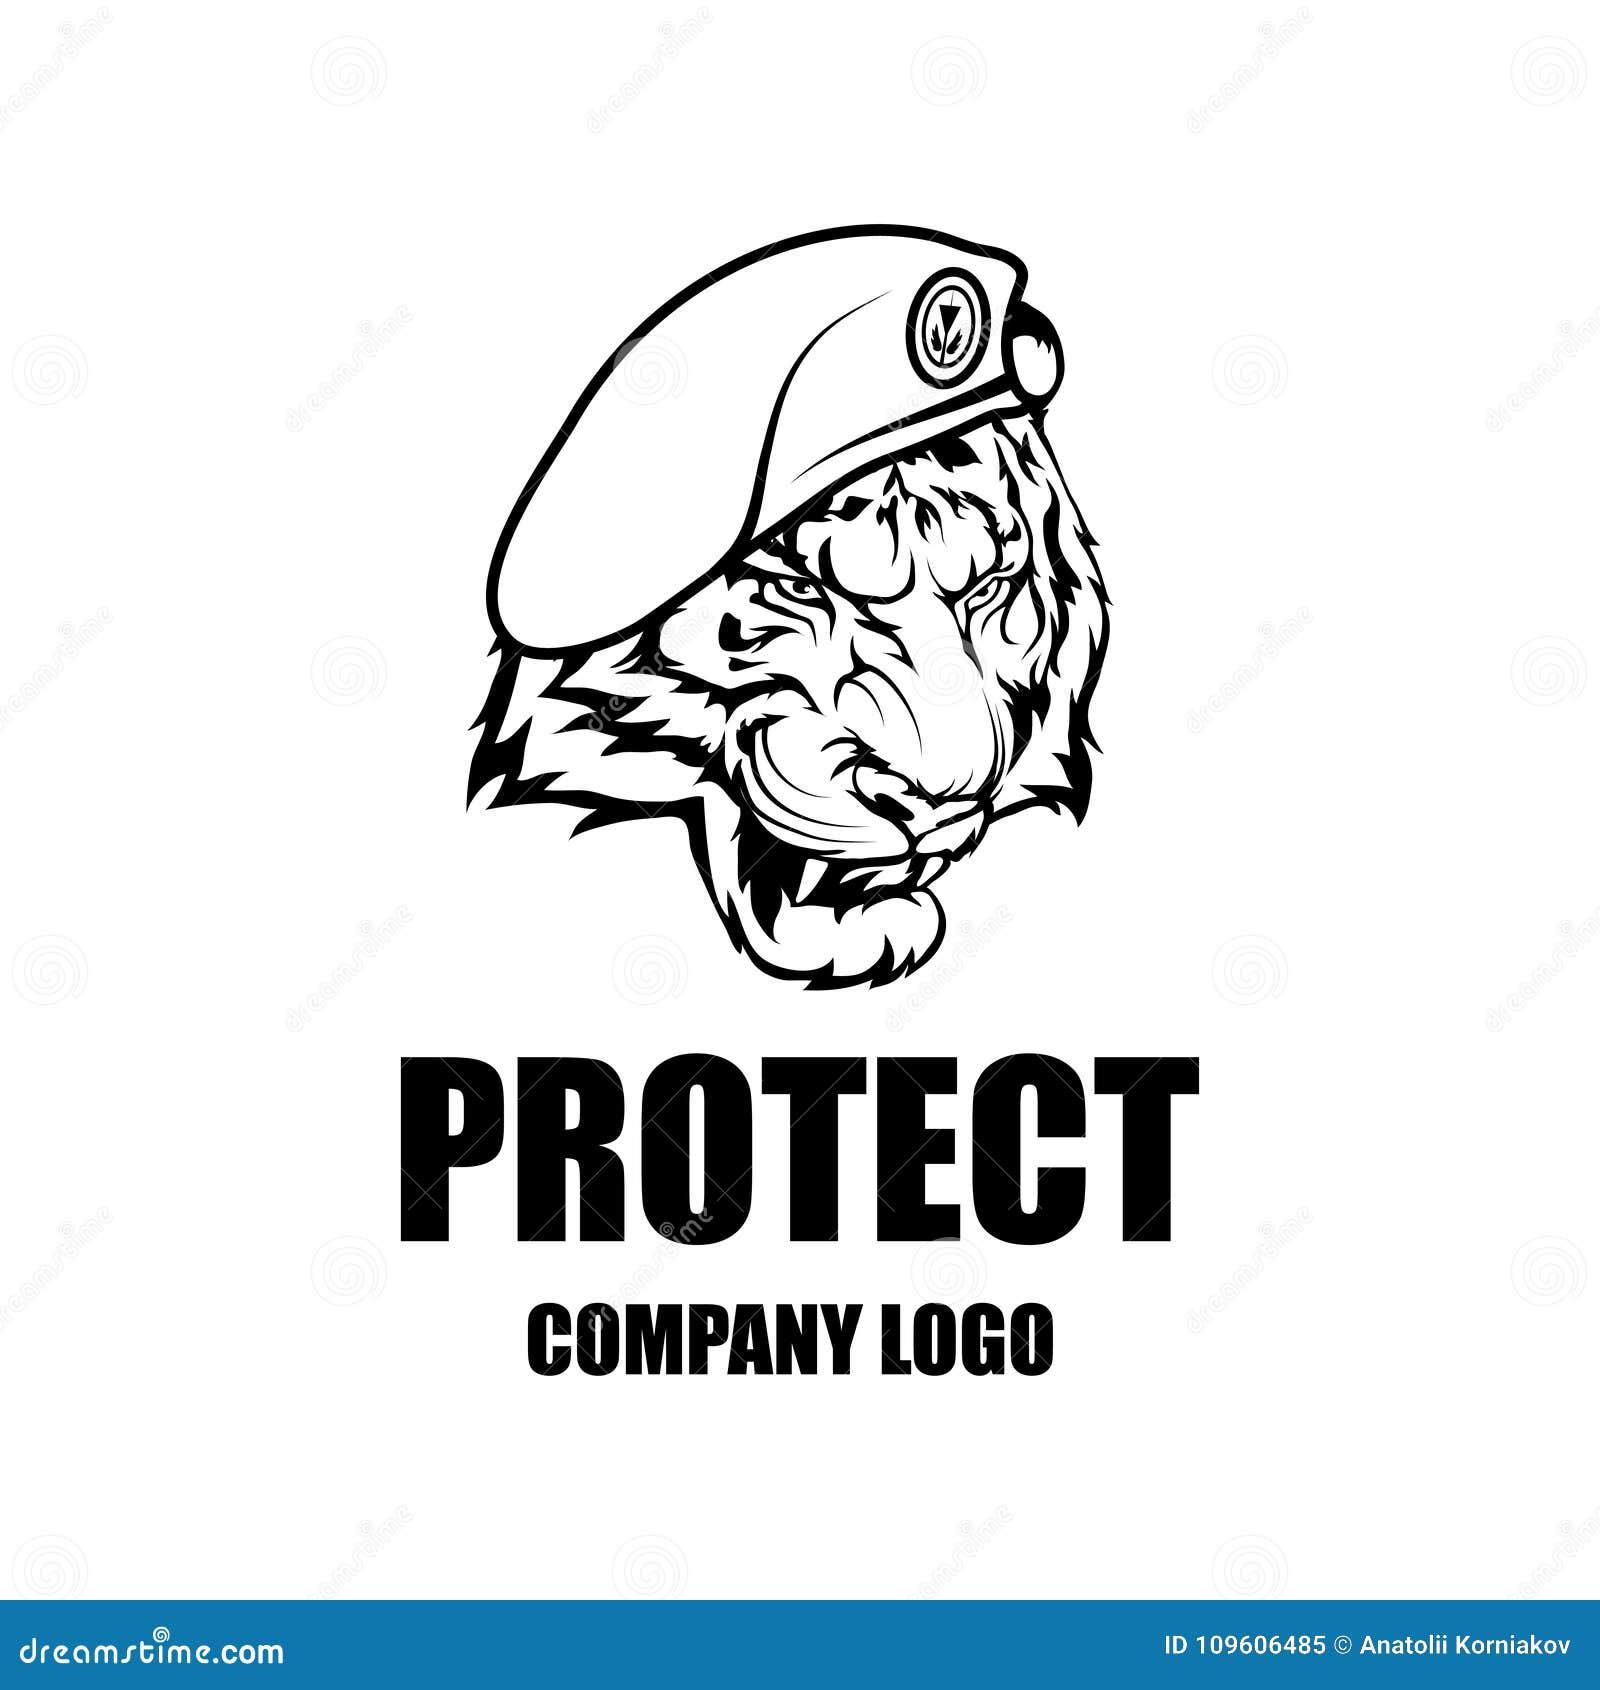 Security company vector logo design template. Protection logo.Tiger in  uniform. Logo icon design. 3ee0ef1ad